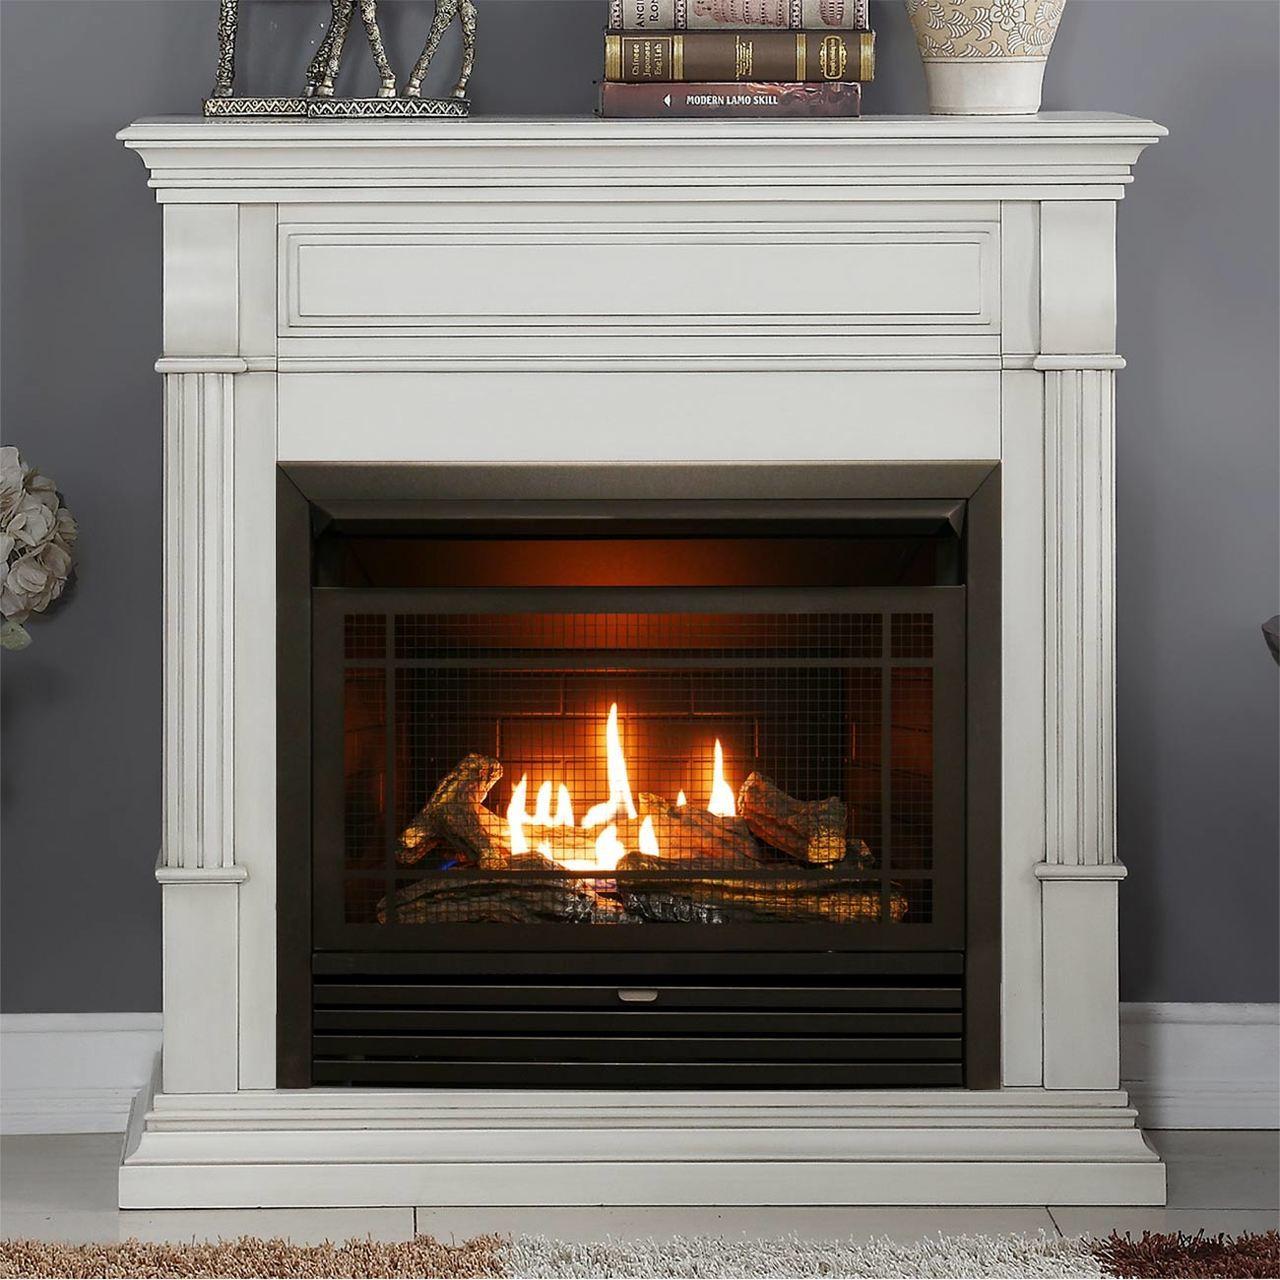 factory buys direct duluth forge dual fuel ventless gas fireplace rh rakuten com gas fireplace design ideas photos gas fireplace design ideas photos